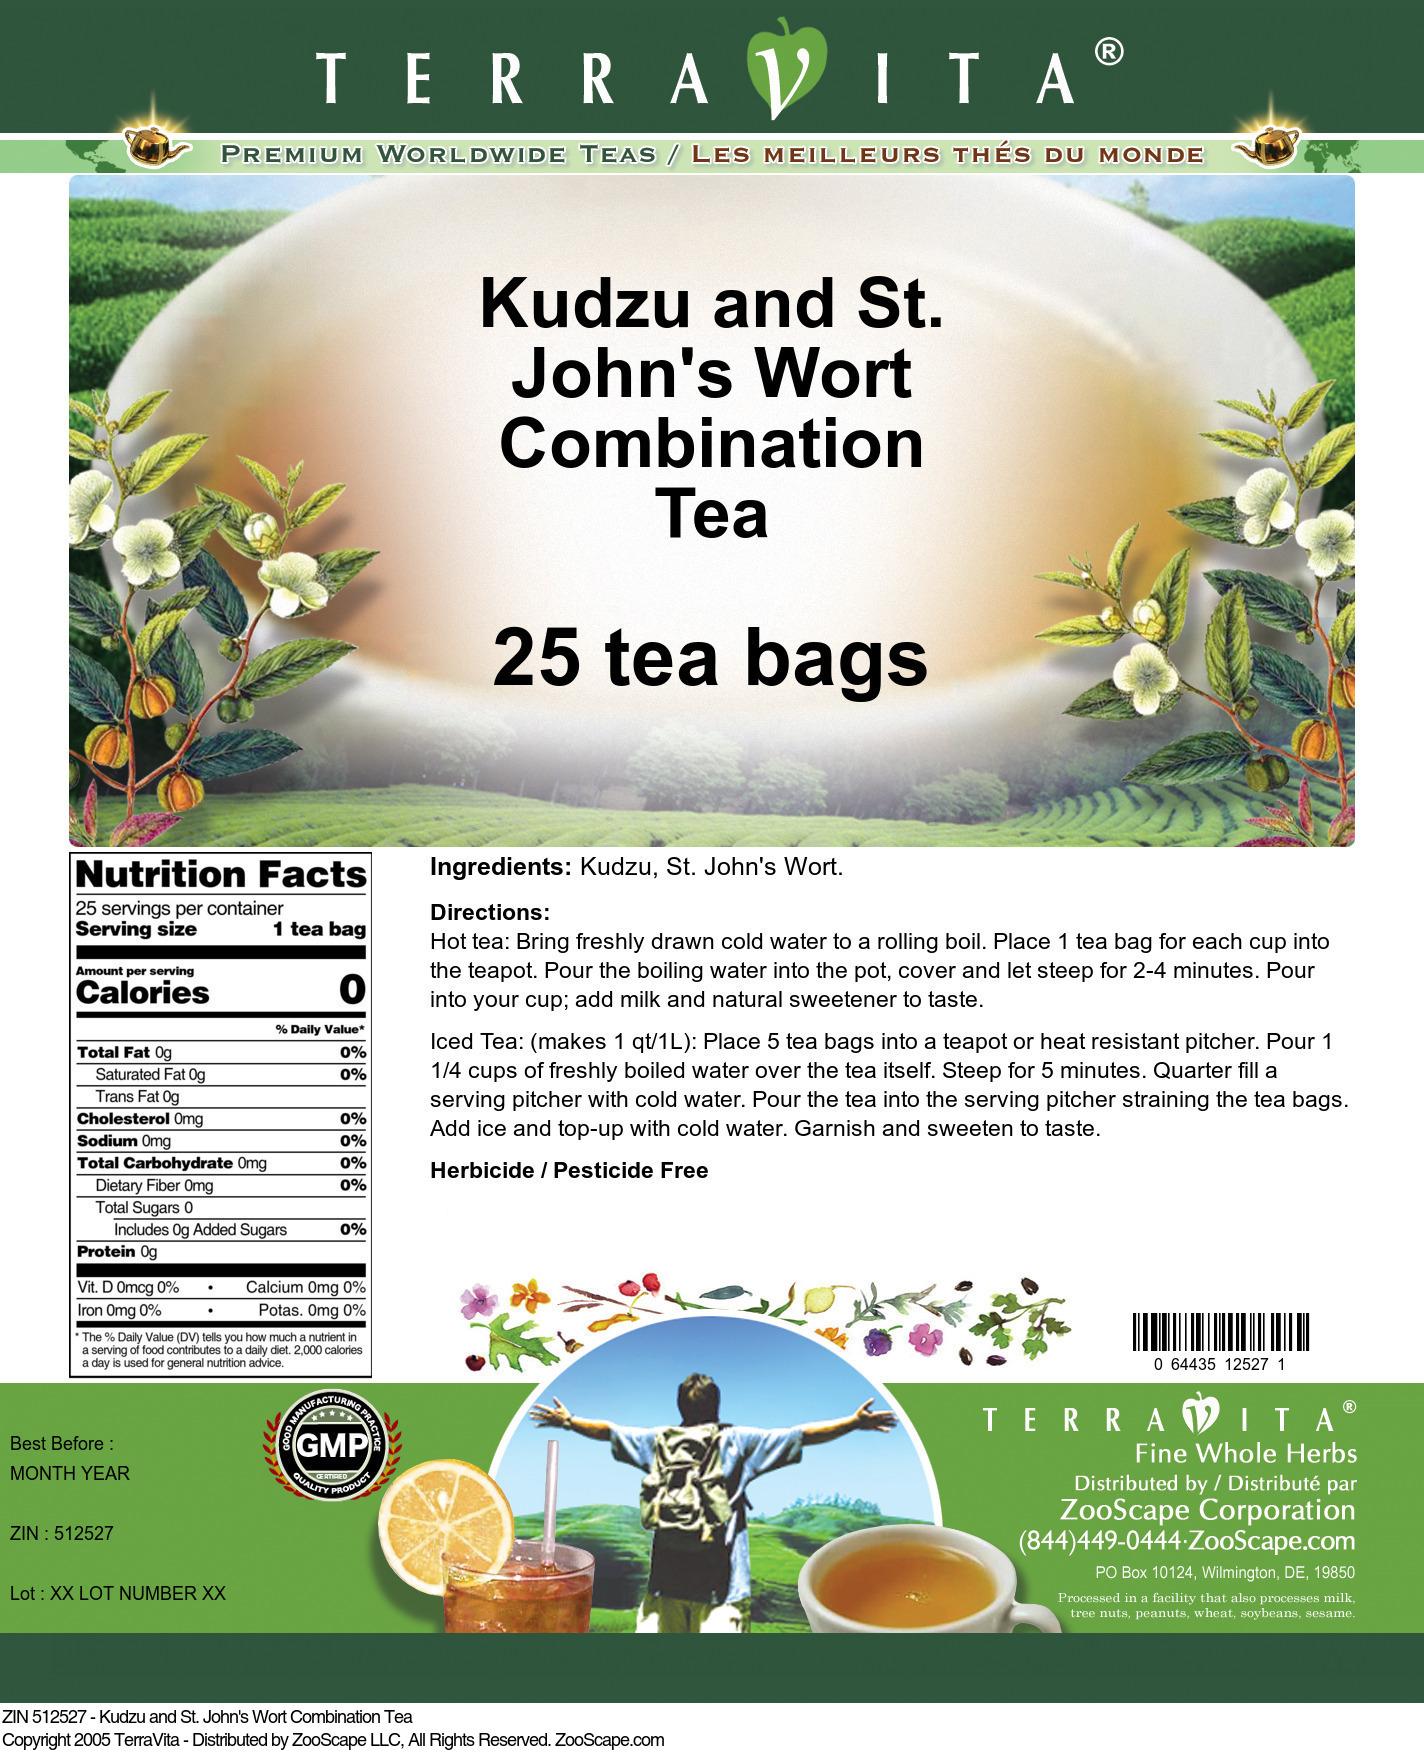 Kudzu and St. John's Wort Combination Tea